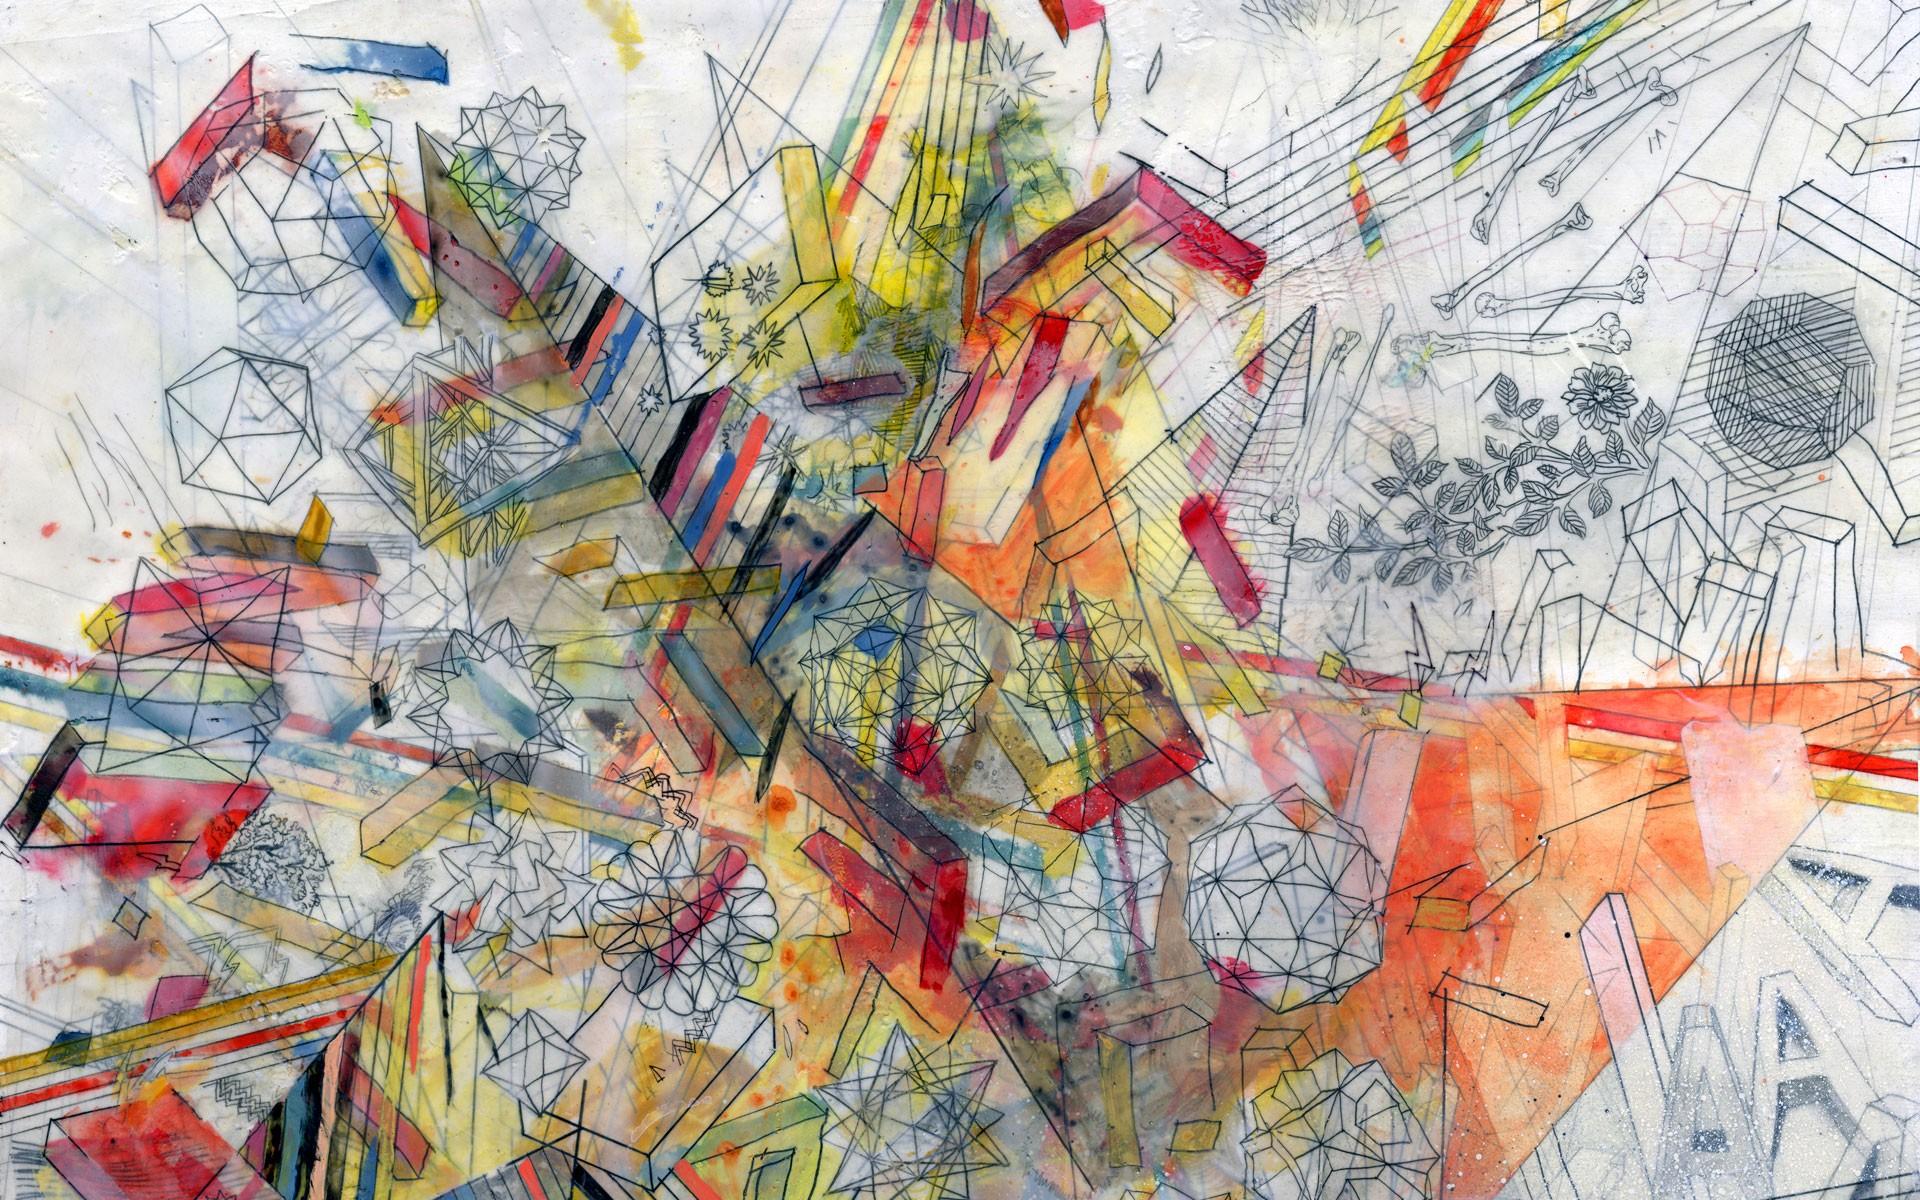 Unduh 200 Wallpaper Abstrak Anak  Gratis